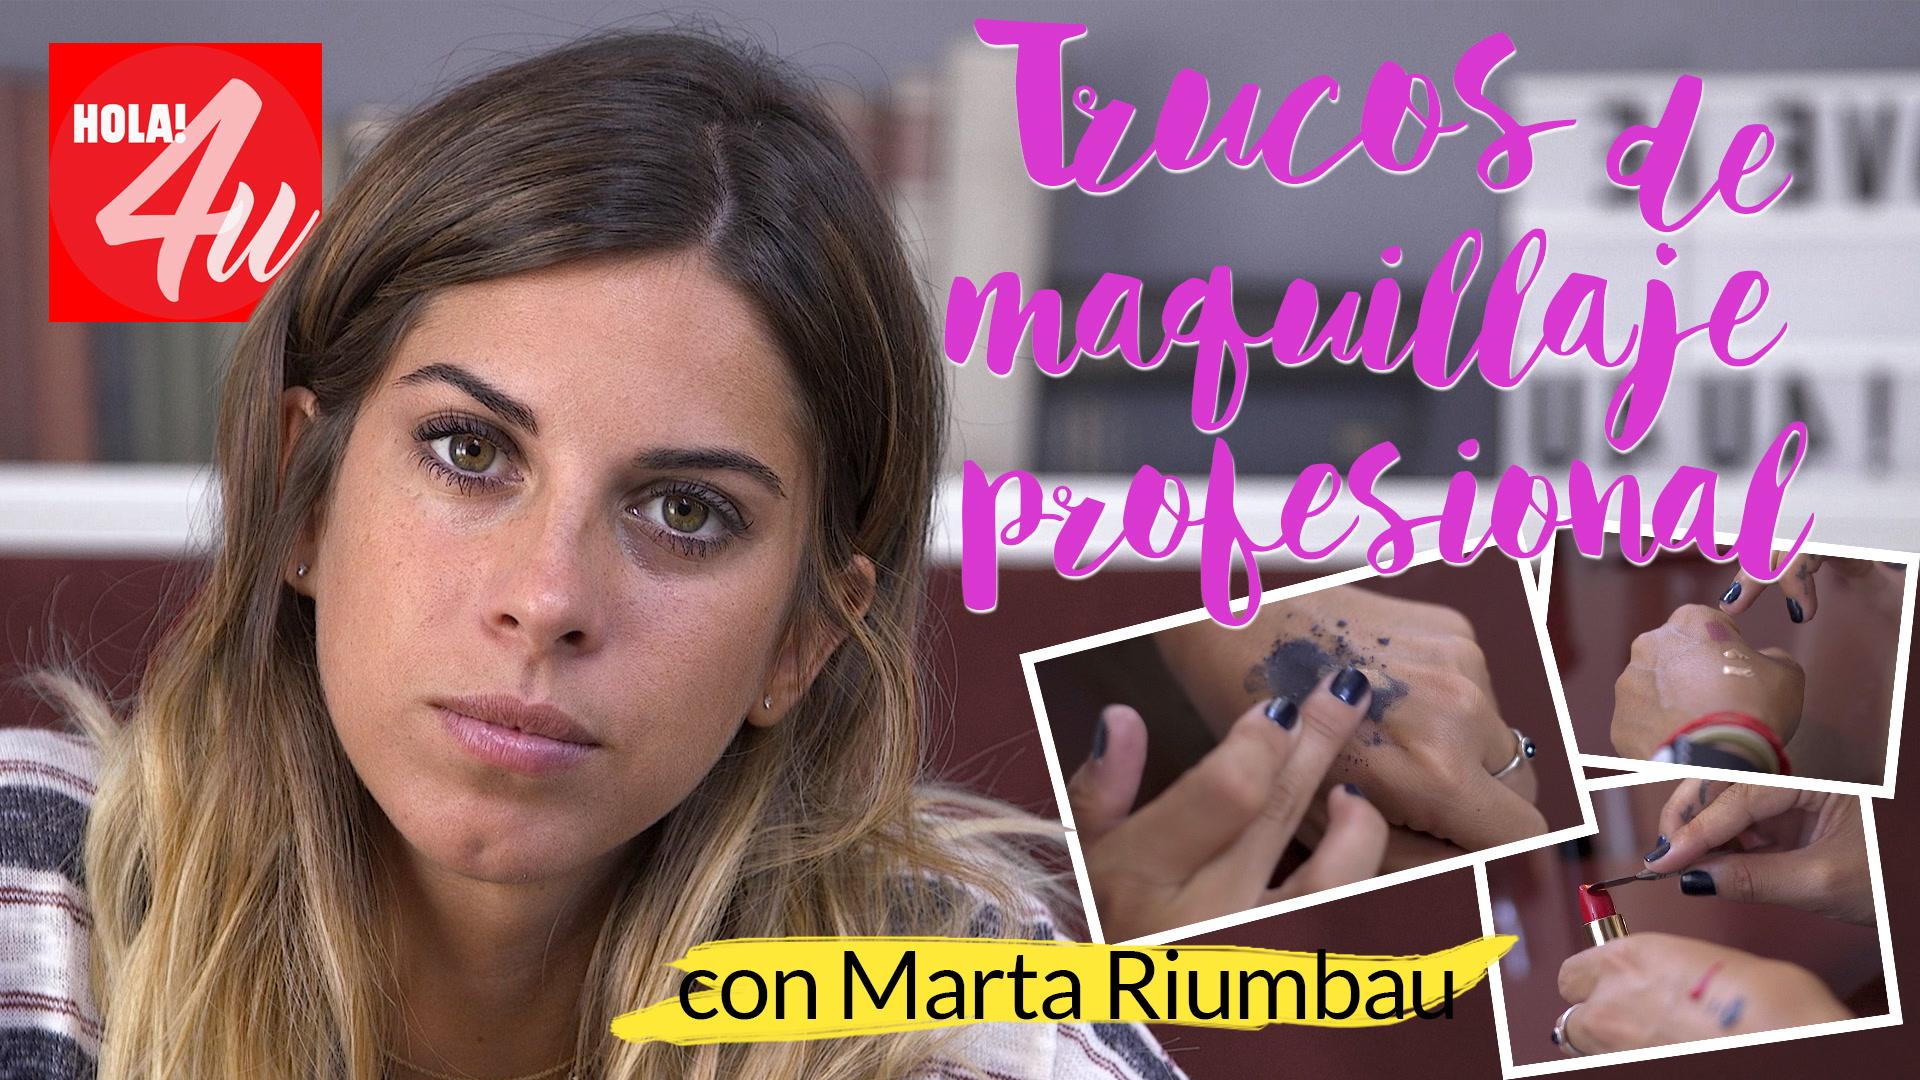 Trucos de maquillaje profesional, ¡mezcla productos! con Marta Riumbau